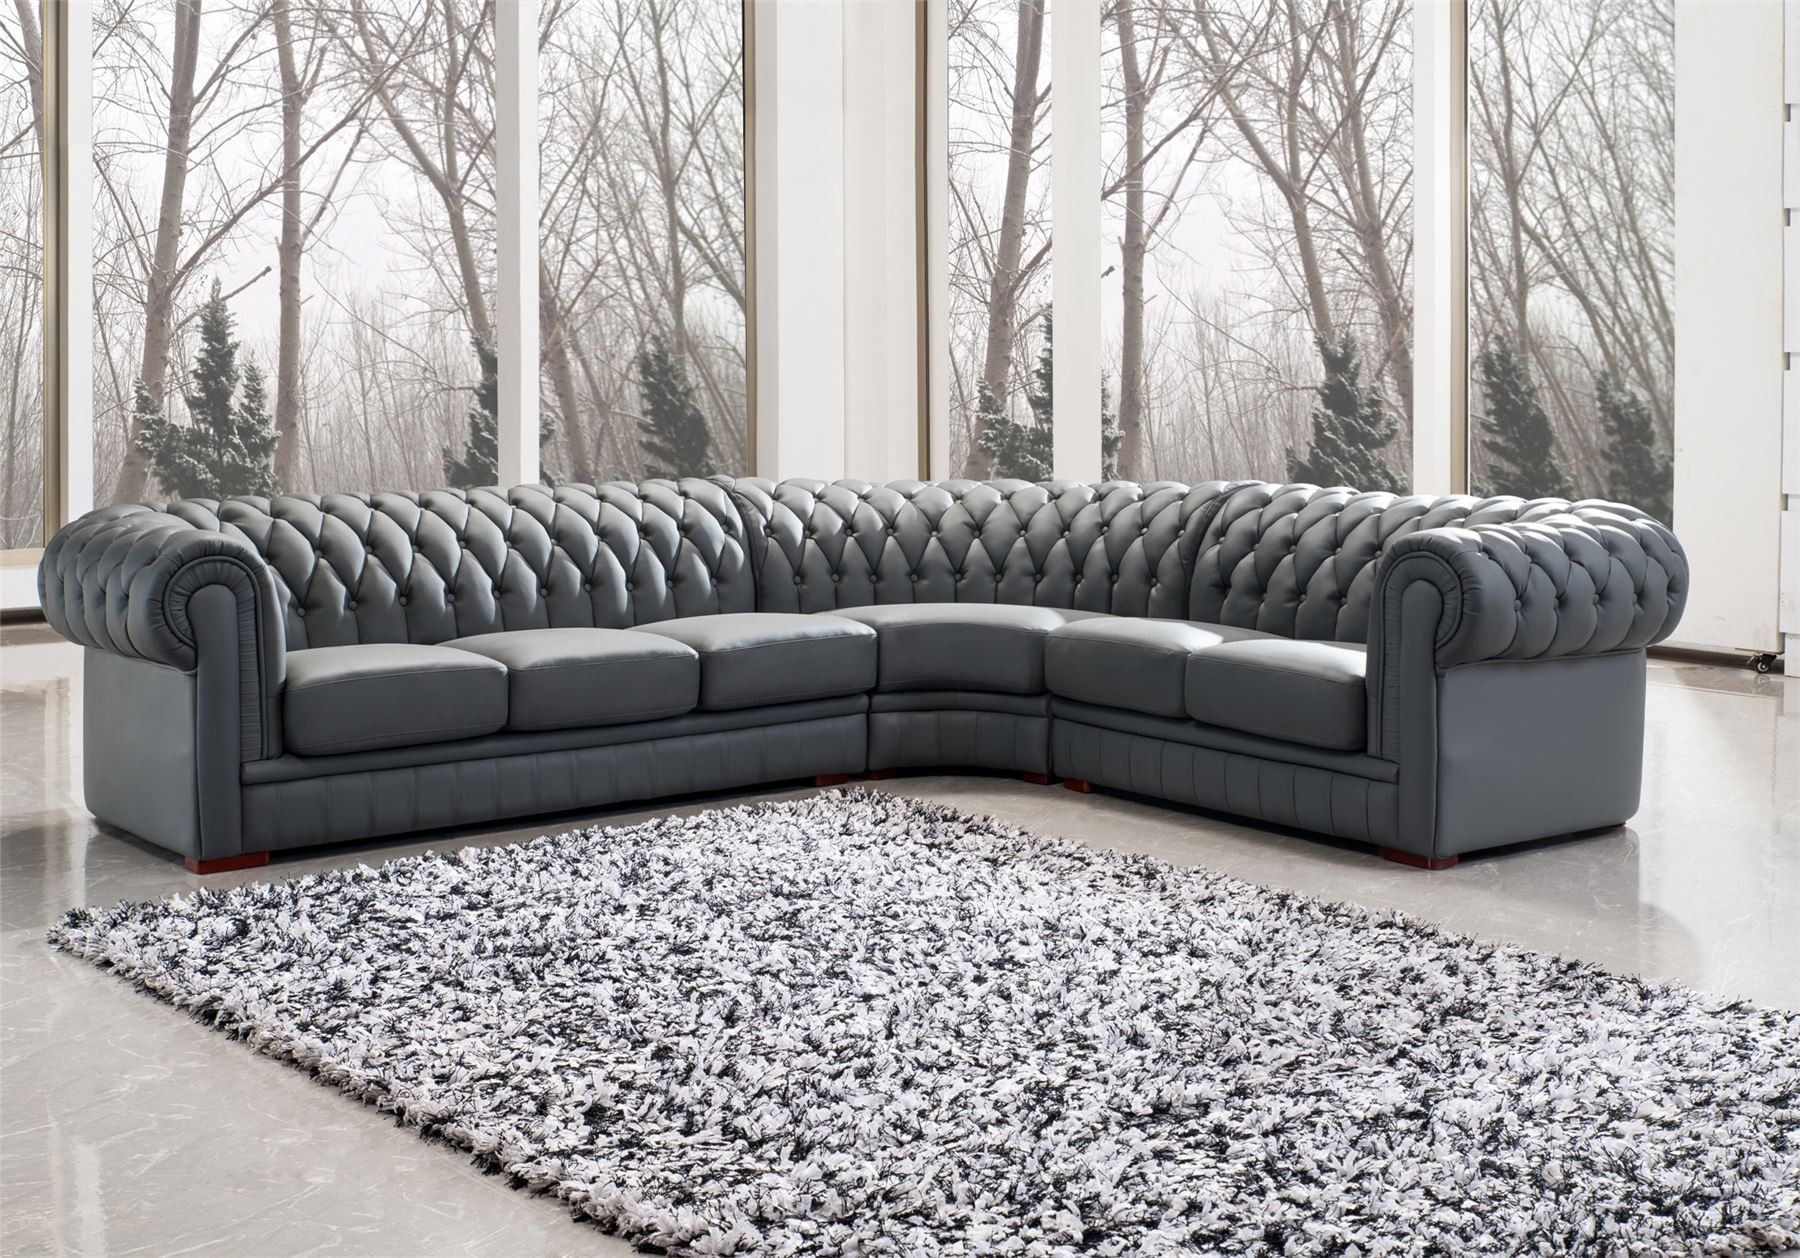 Cool 43 Classy Curved Leather Sectional Sofa Ideas Luxury Chesterfield Sofa Leather Sectional Sofas Custom Sofa